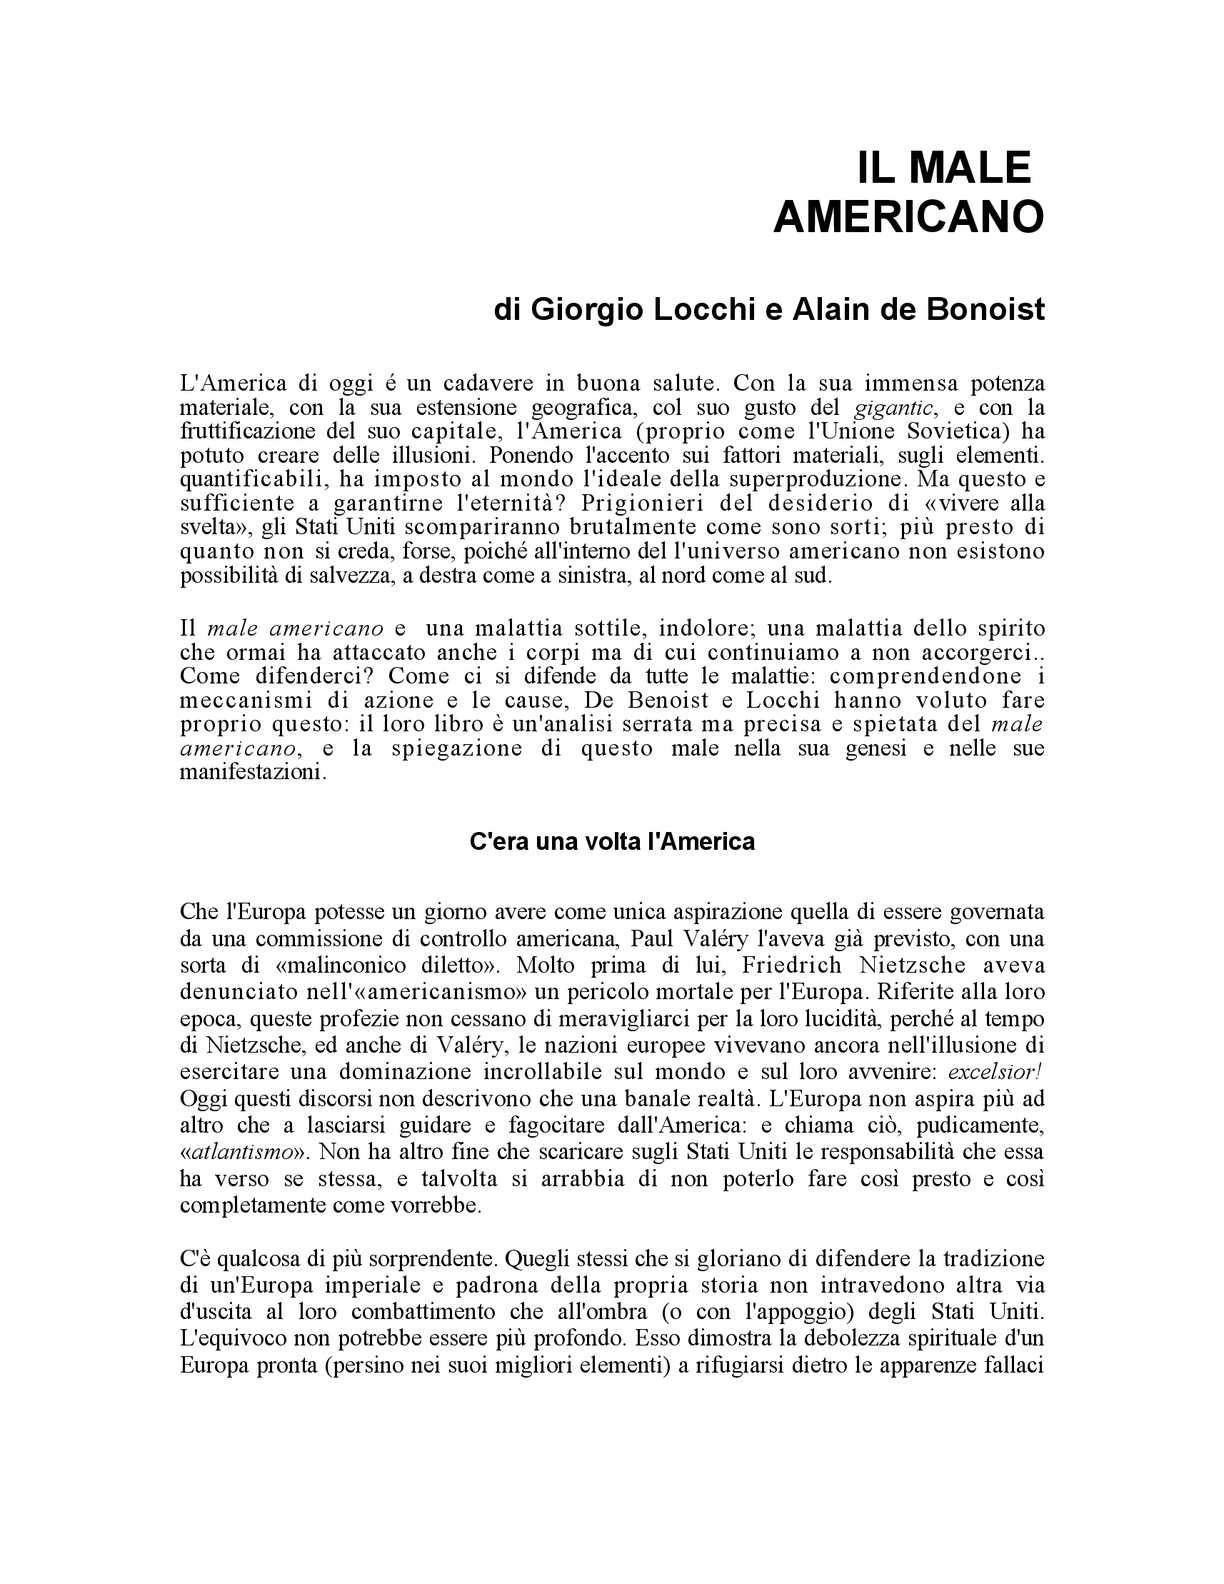 Locchi Una C'era L'america Volta Calaméo Giorgio 0qH8w